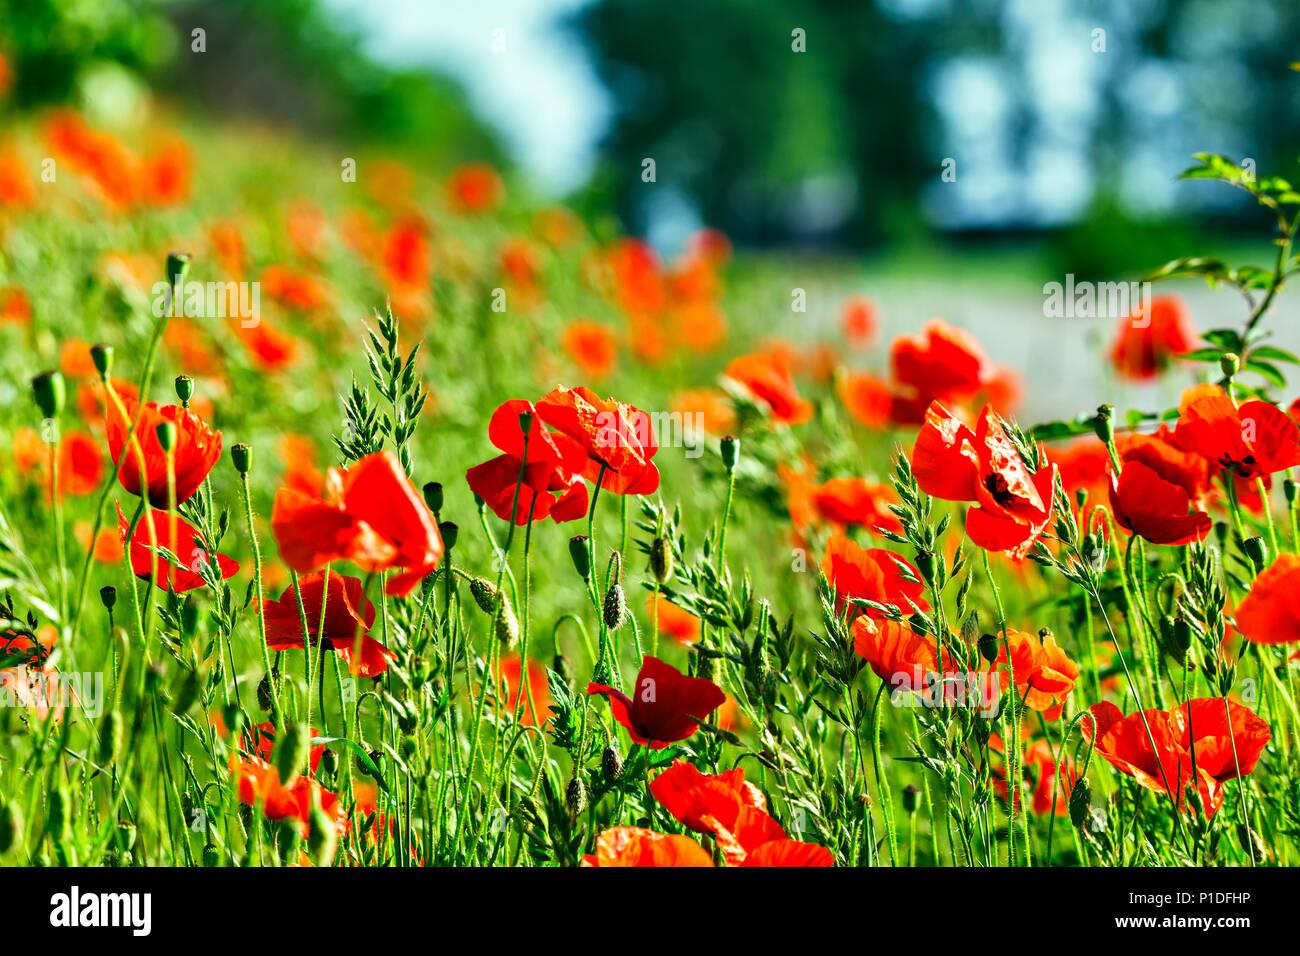 Opium Poppies Flowers Drugs Garden Heroin Stock Photos Opium